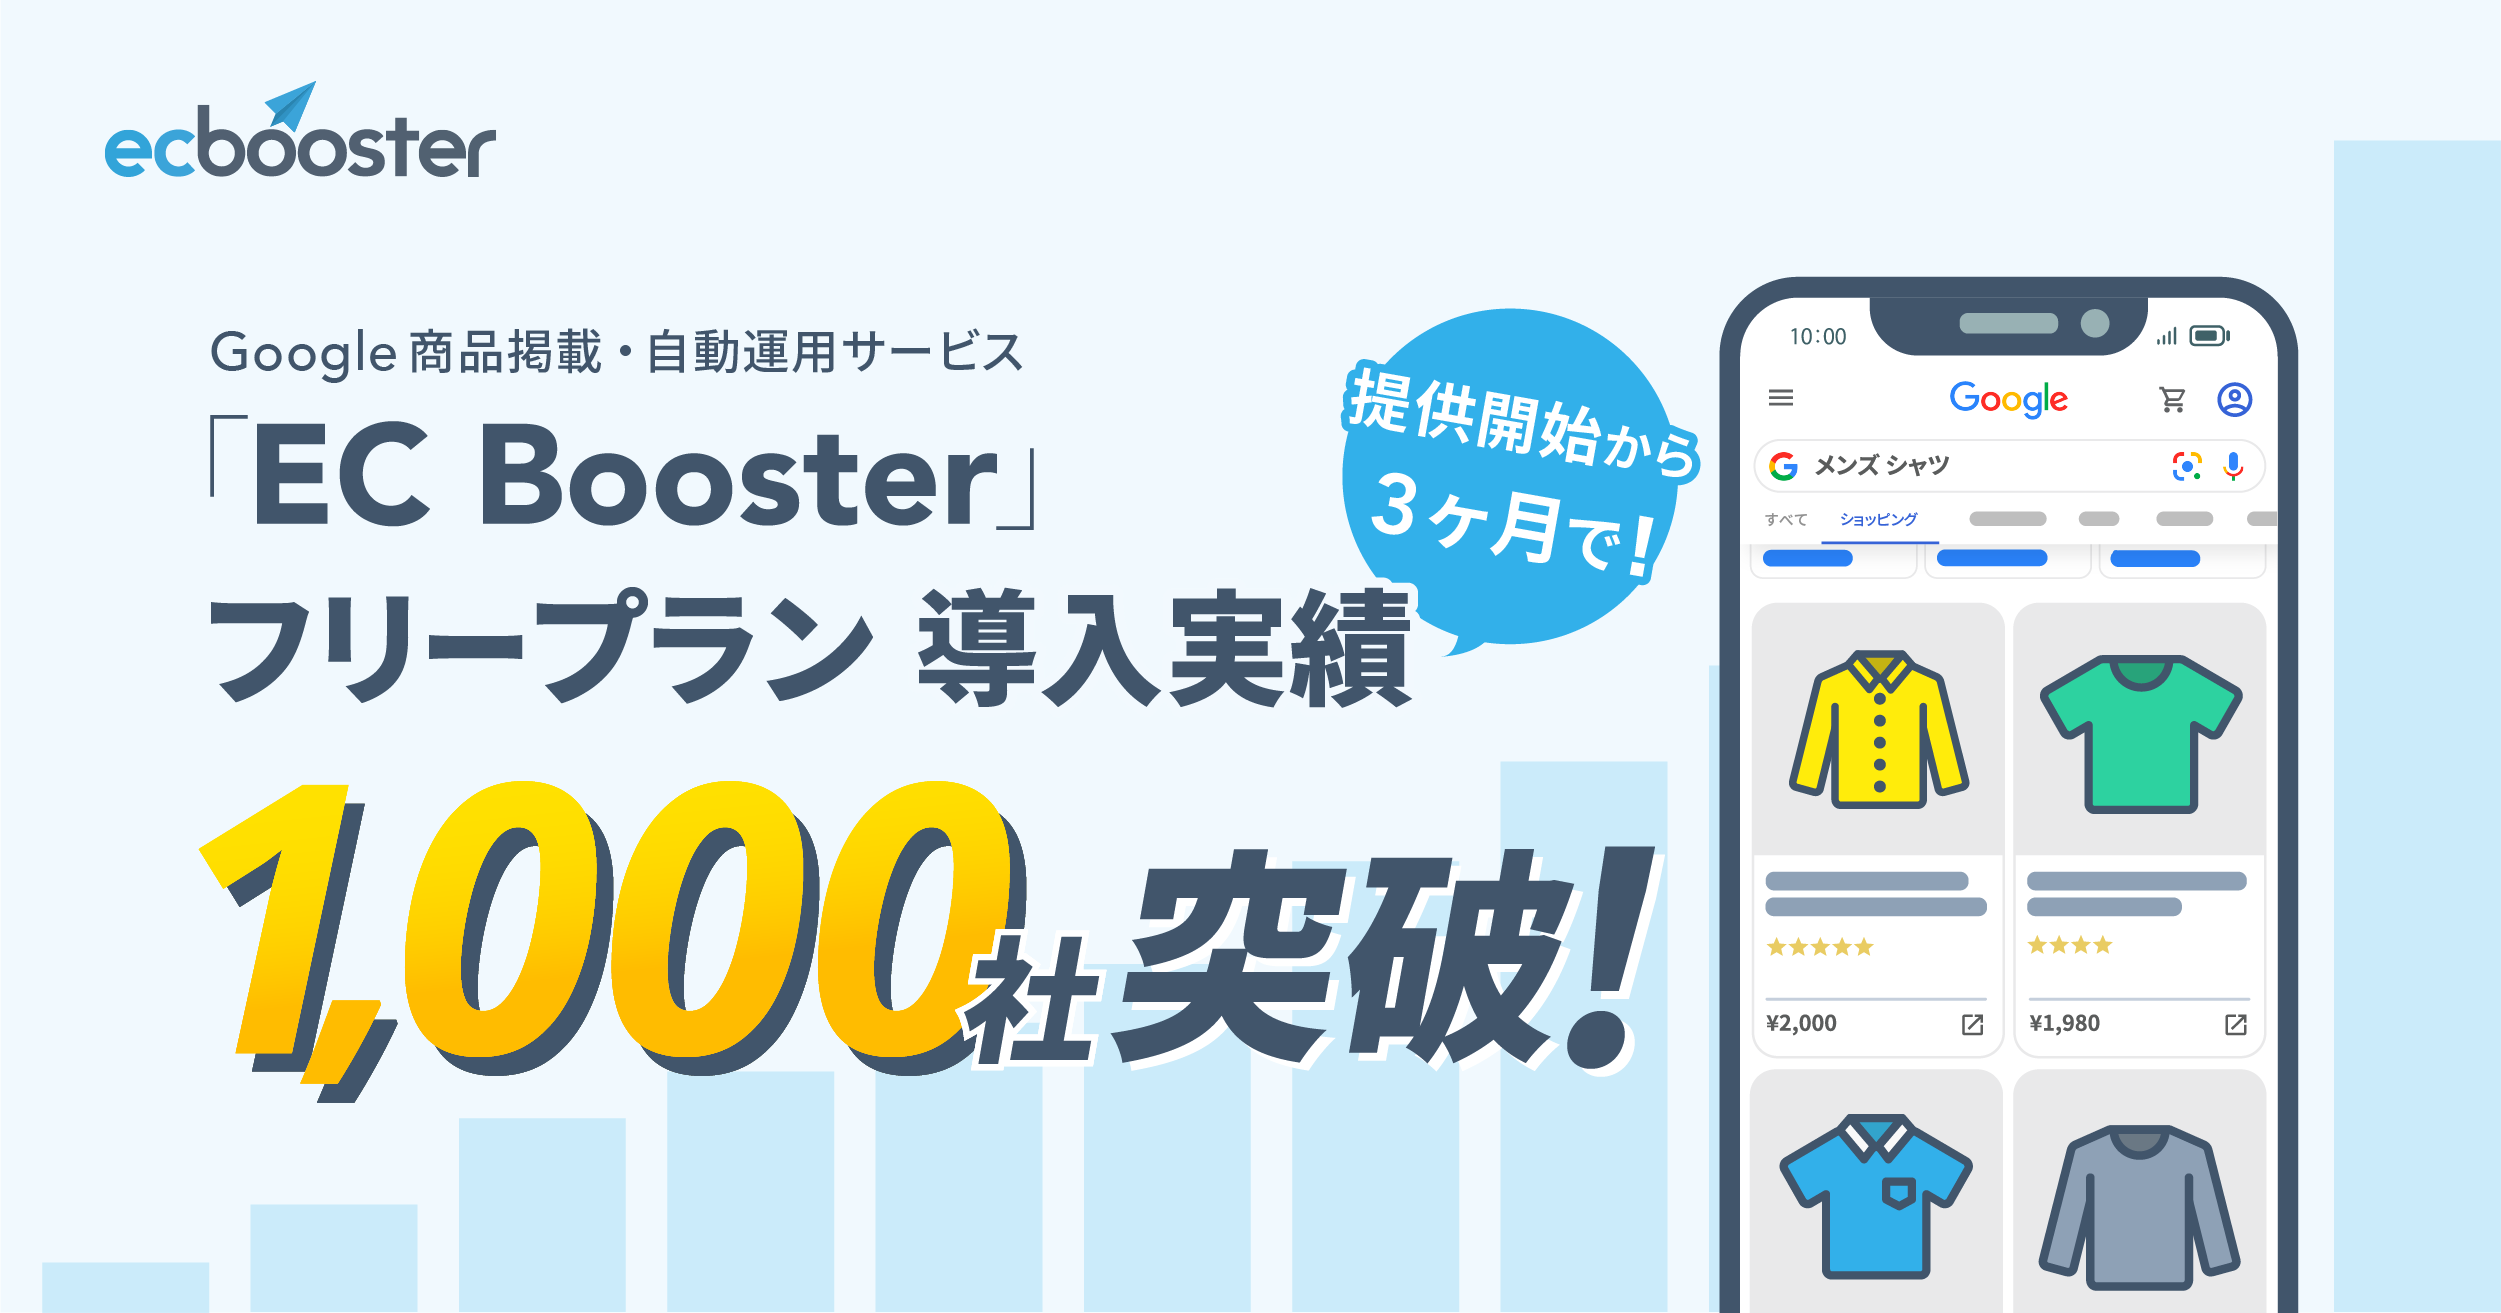 Google 商品掲載・自動運用サービス「EC Booster」、フリープラン提供開始3ヵ月で導入実績1,000社突破!